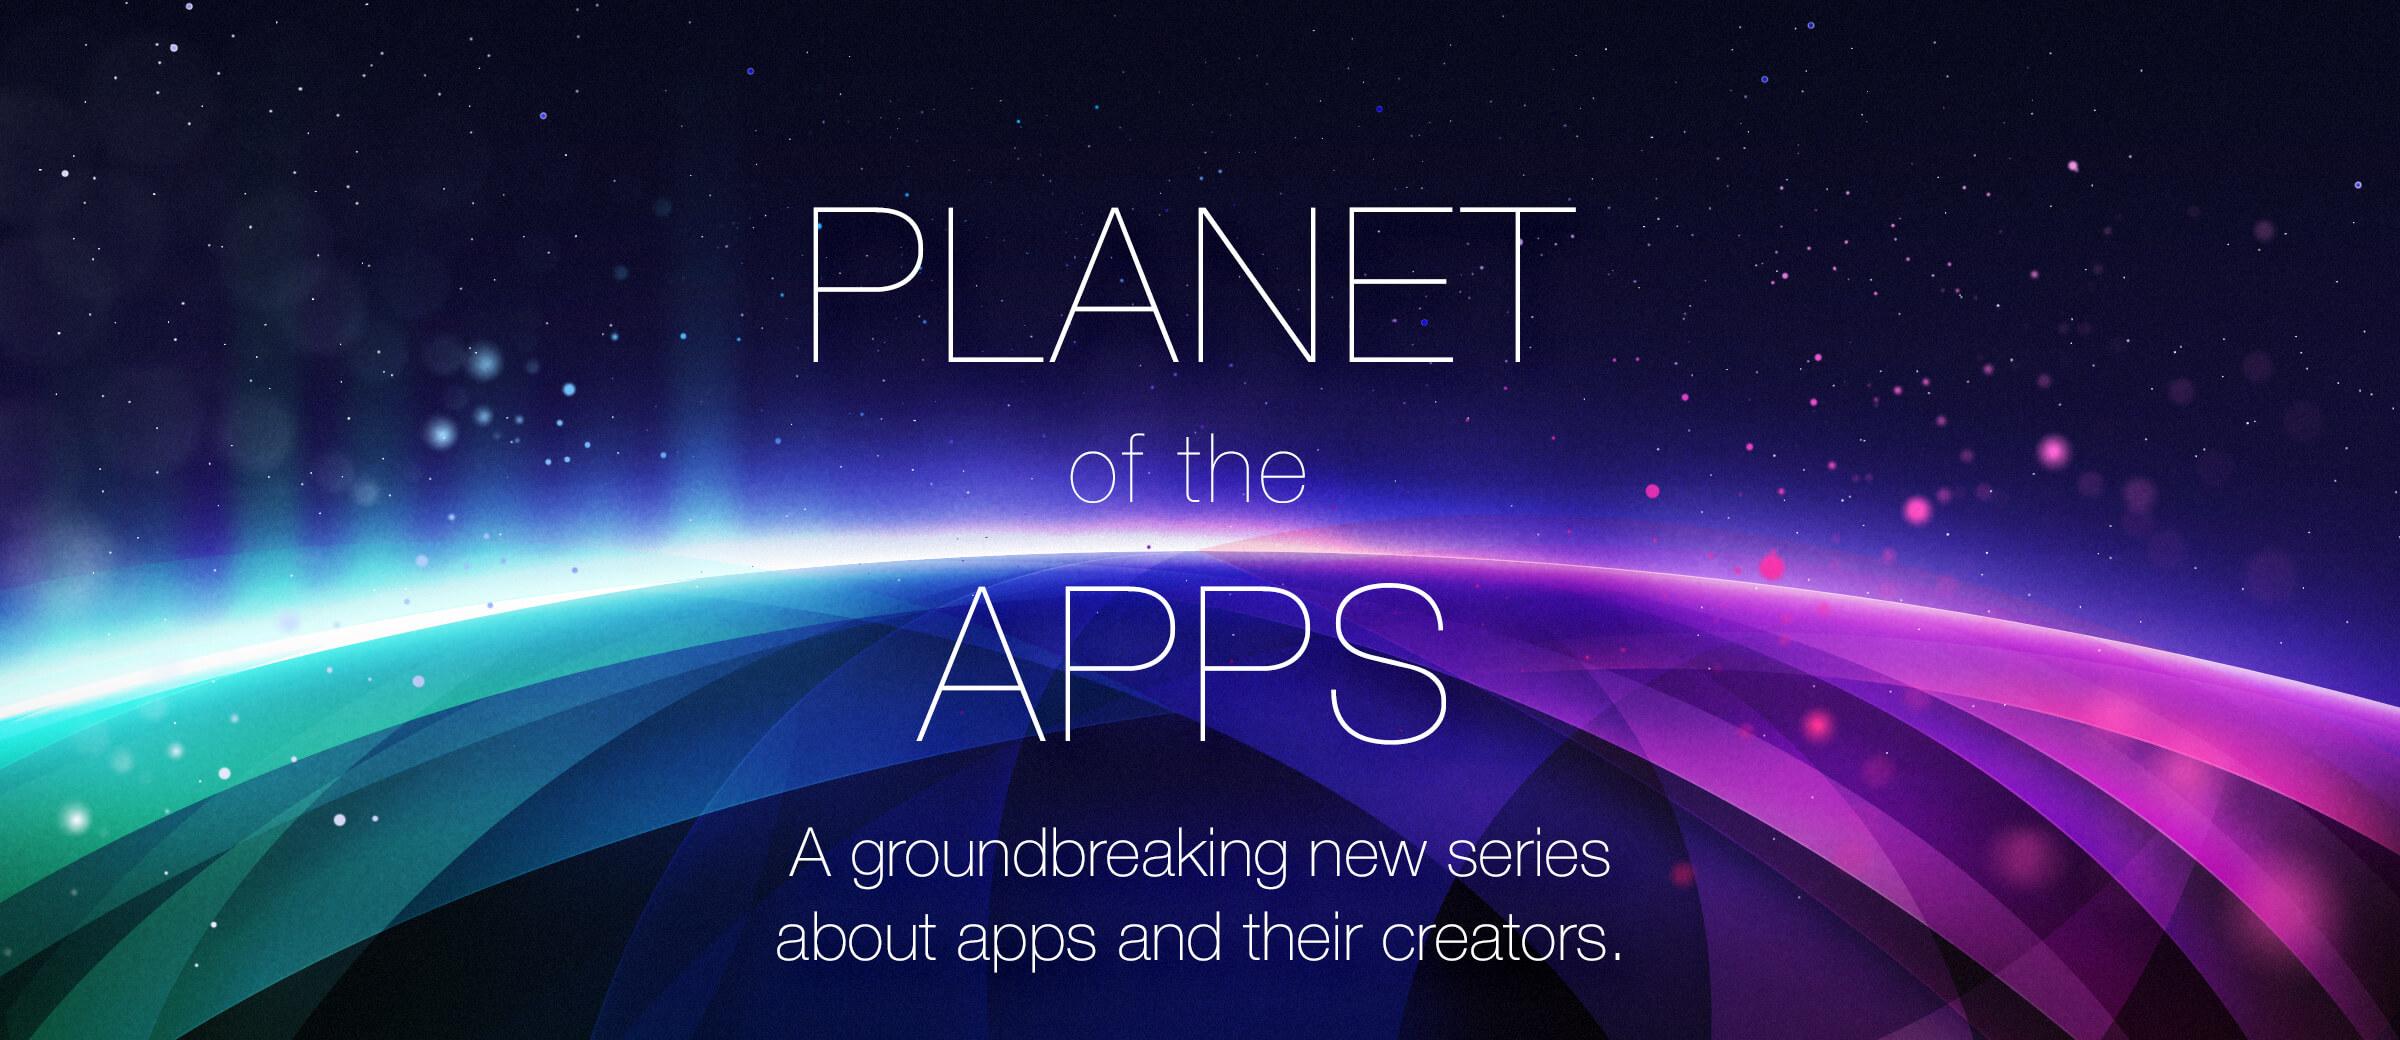 Se acerca el primer show original de Apple: Planet of the Apps